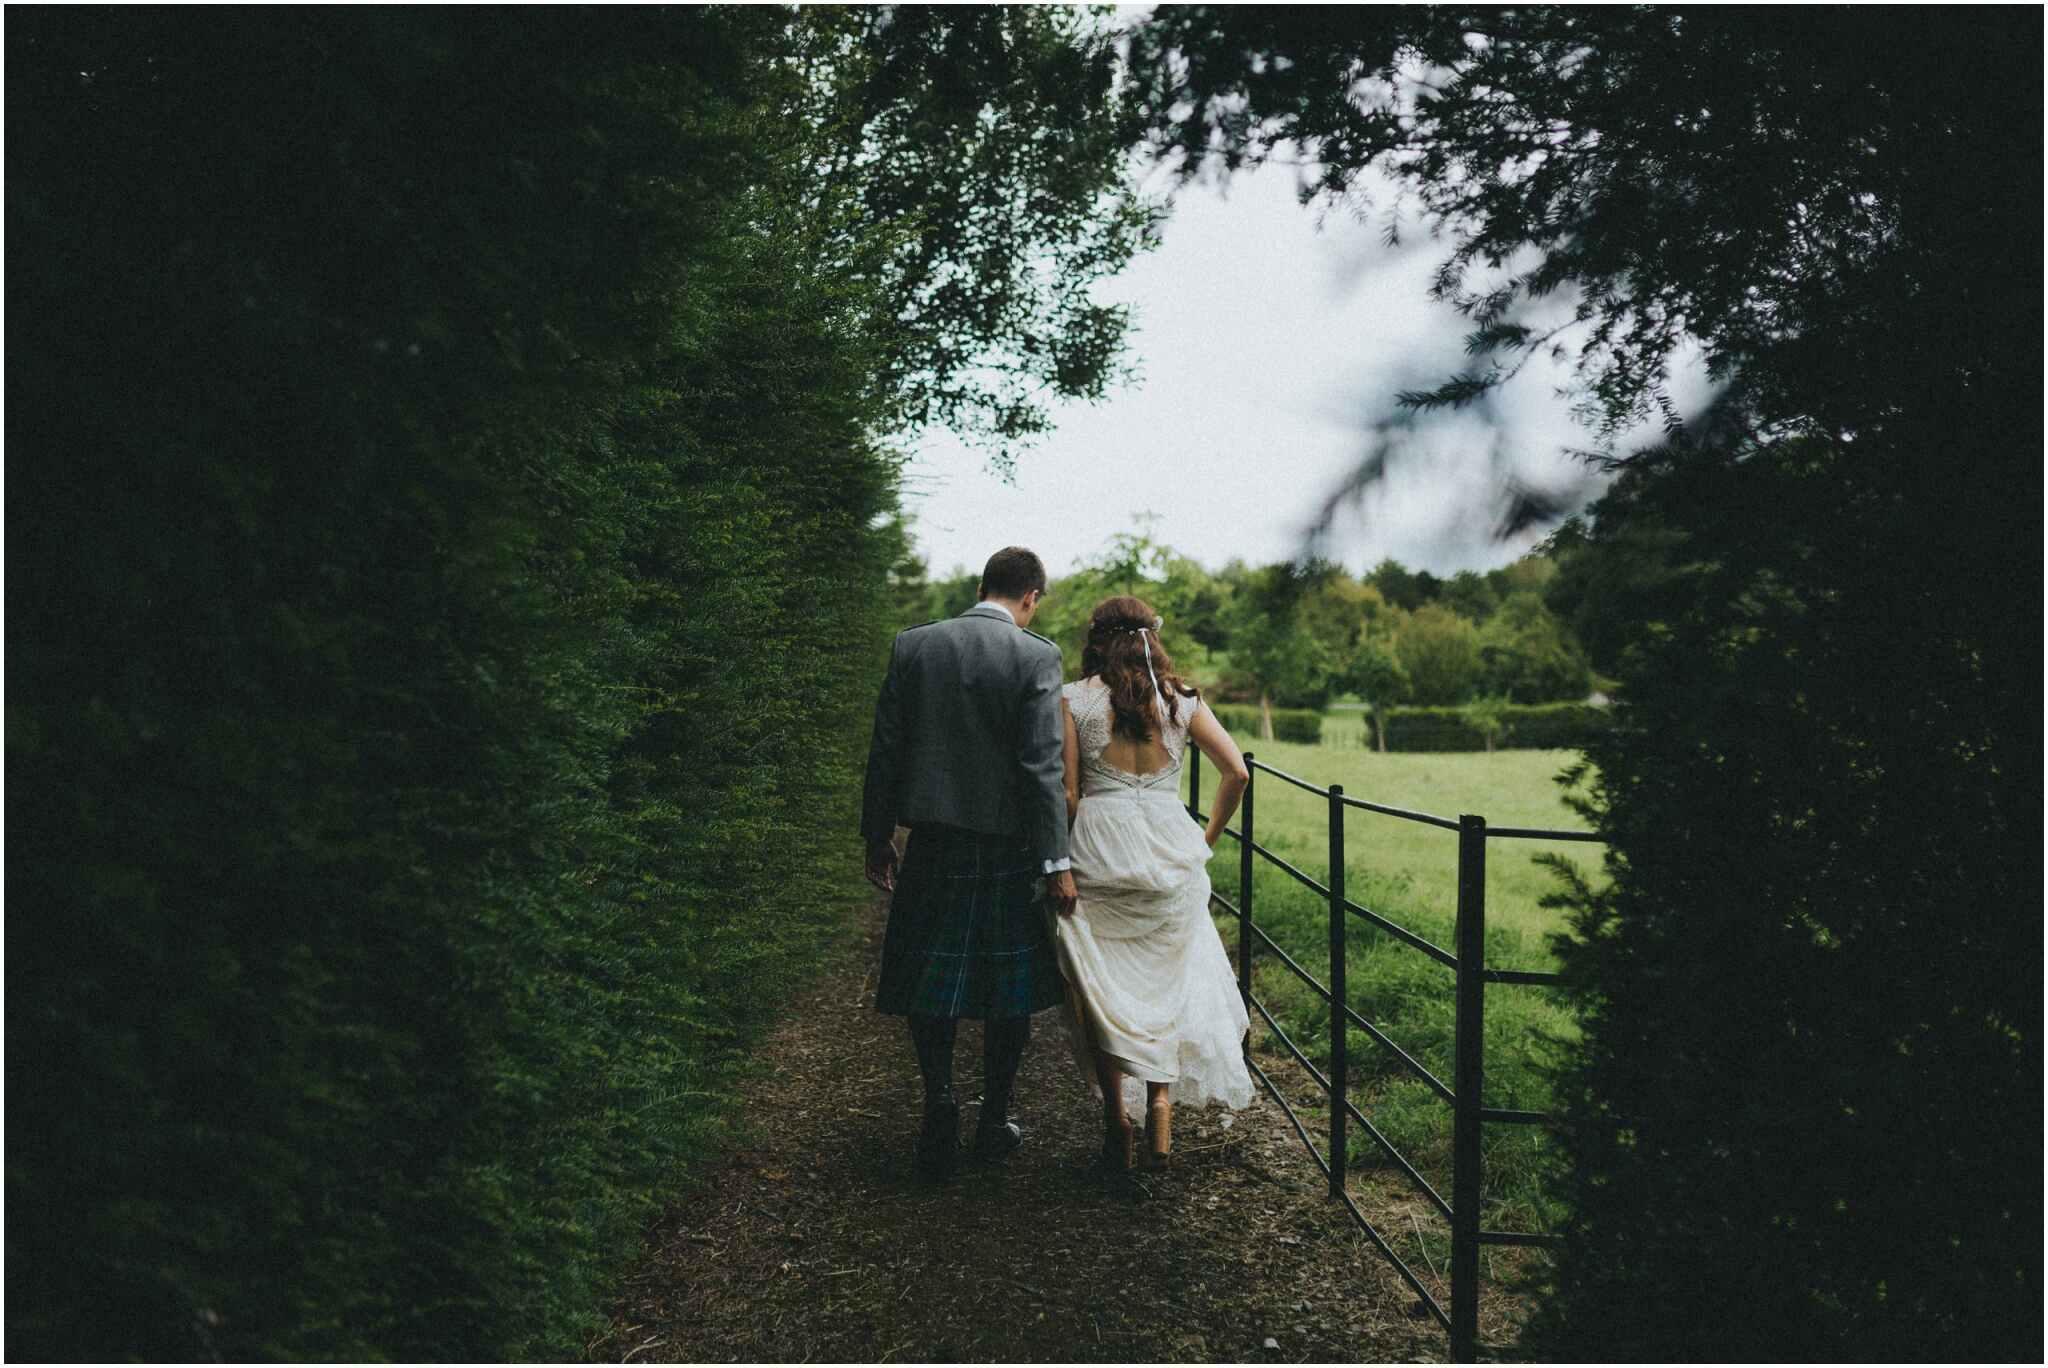 Fionnuala + Paul - Mount Druid Alternative Wedding 145